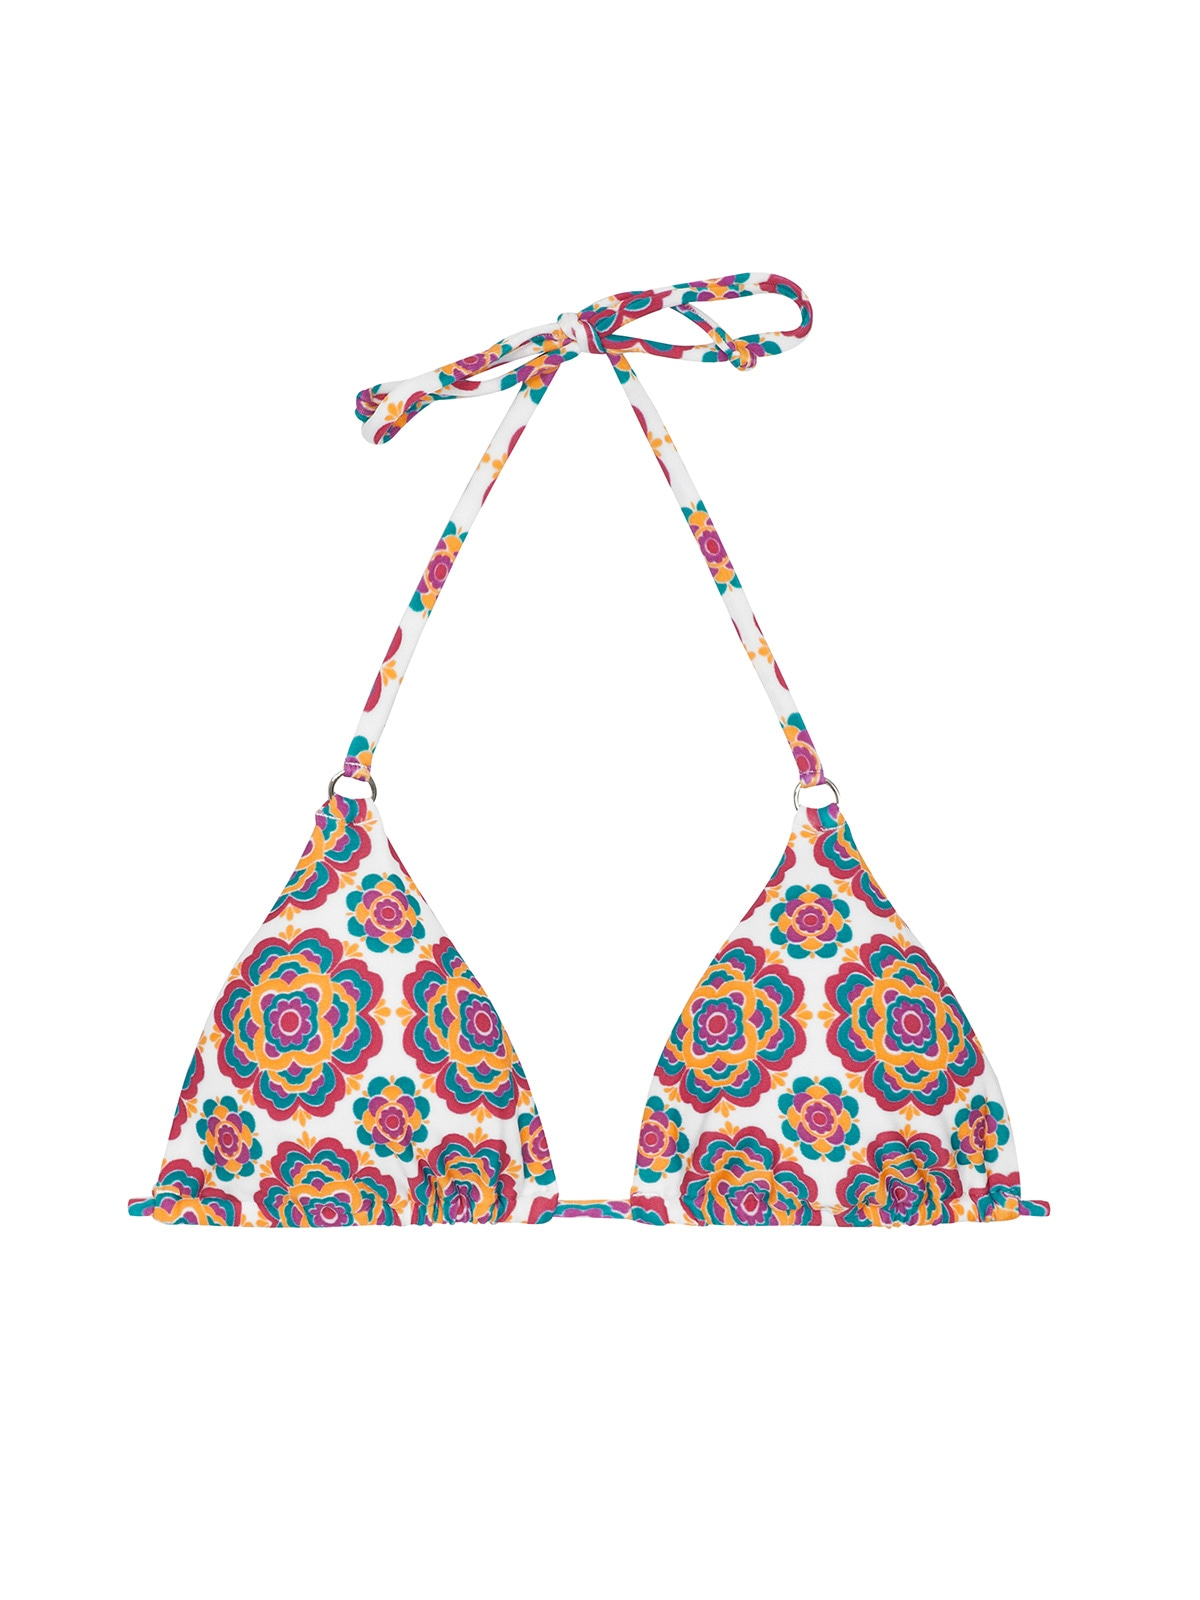 a76bc04dc Bikini Tops Retro Print Triangle Bikini Top - Soutien Beira Rio Cheeky